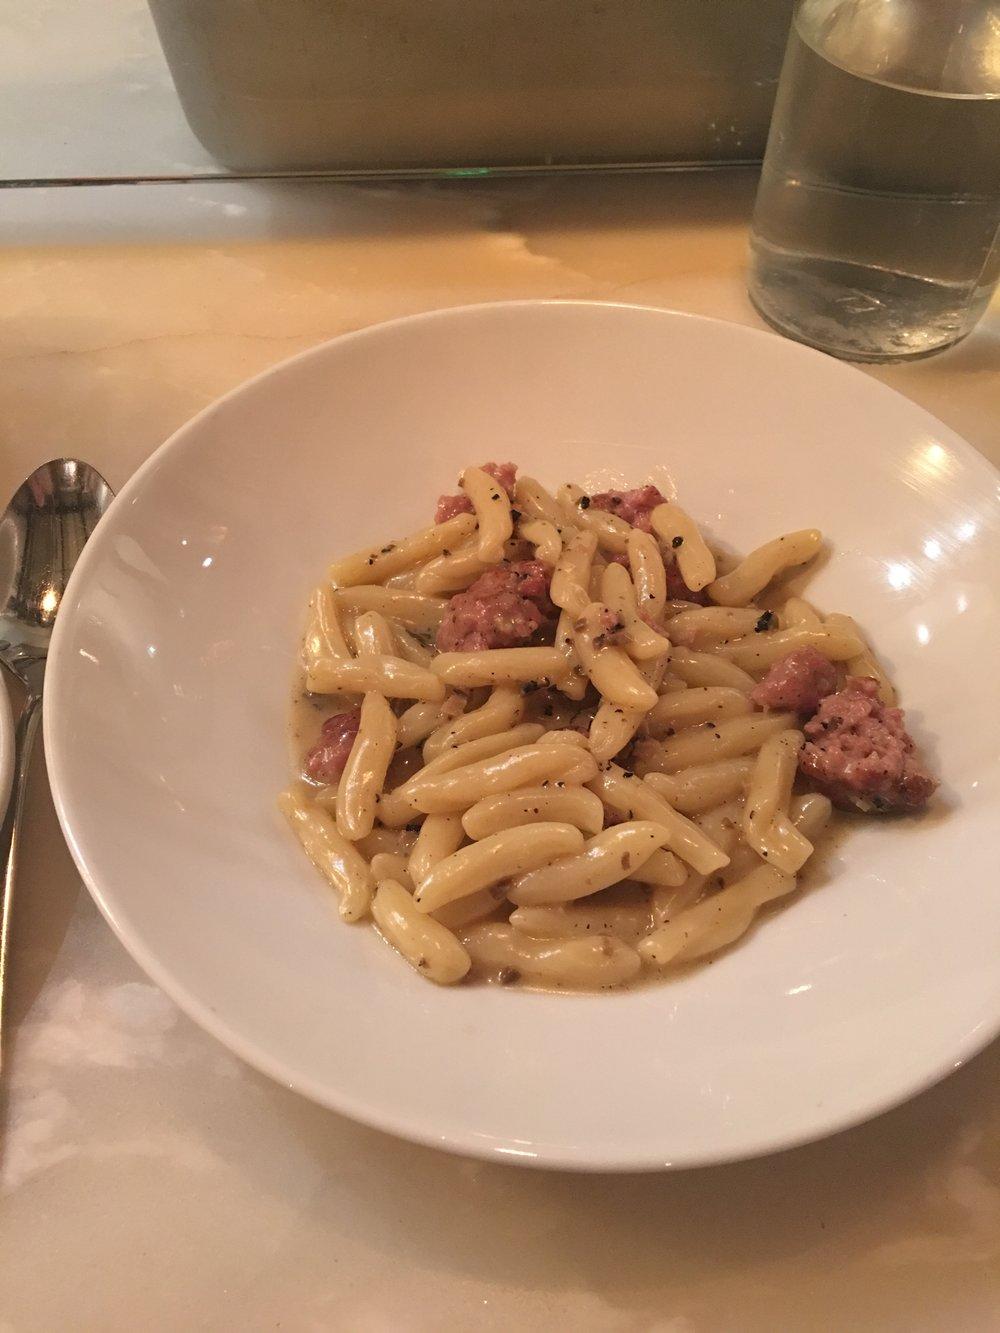 Tagliatelle al Sugo Di Maiale. pork ragu. housemade speck. cabbage. caraway seeds.